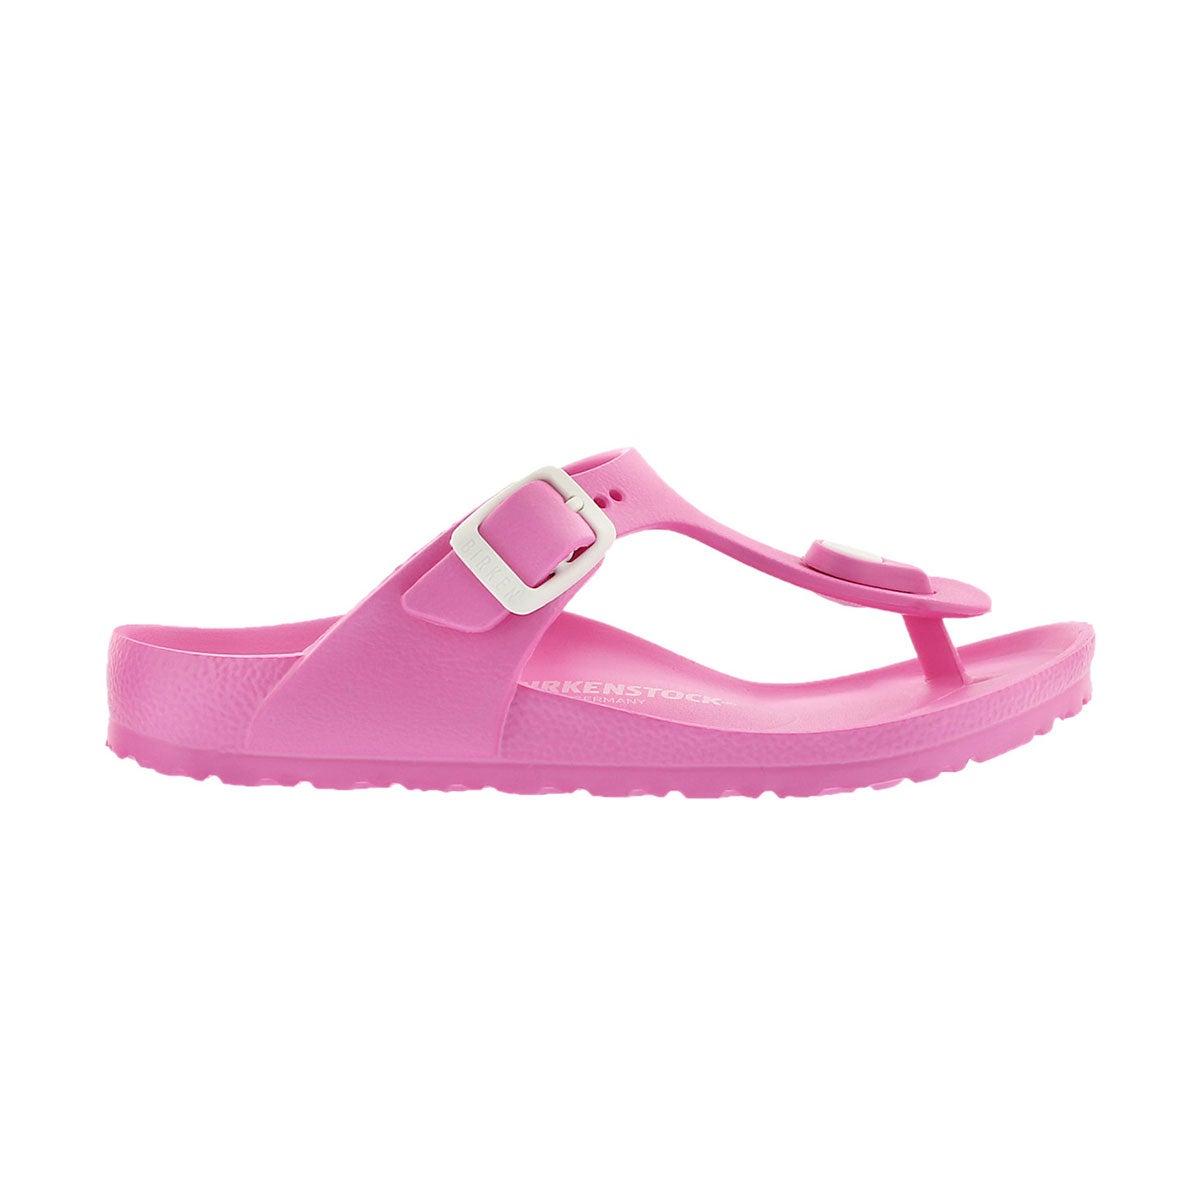 Girls' Gizeh EVA sandal - Fuchsia